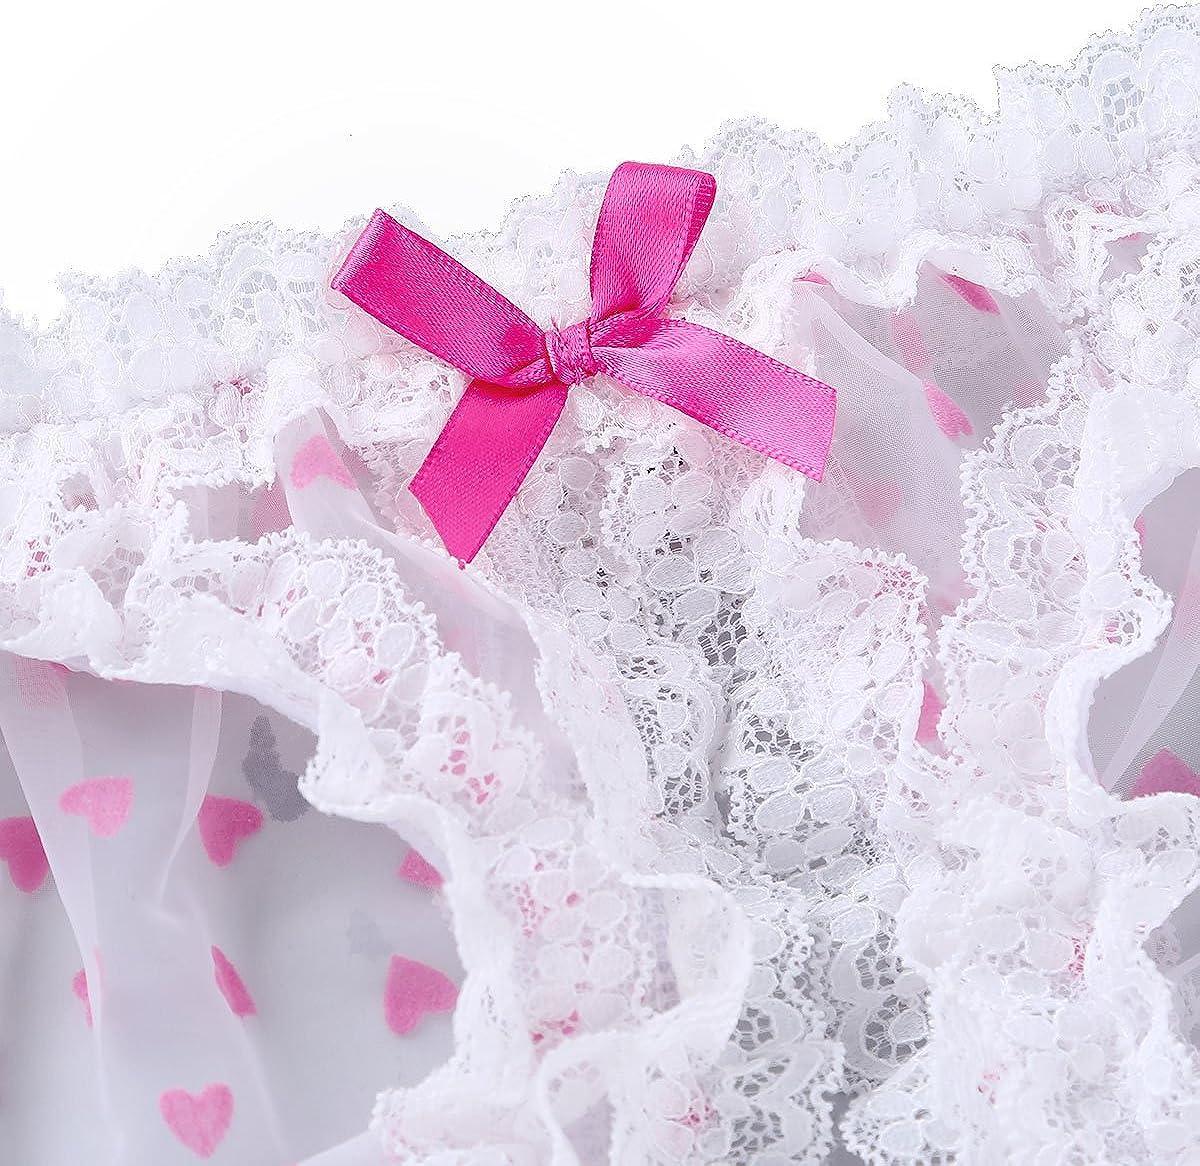 iixpin Sissy Ouvert-Panty Herren Pink Herz Transparent String Slip Bikini Erotik Dessous Bikini G-String Tanga Unterw/äsche Partykleidung Clubwear